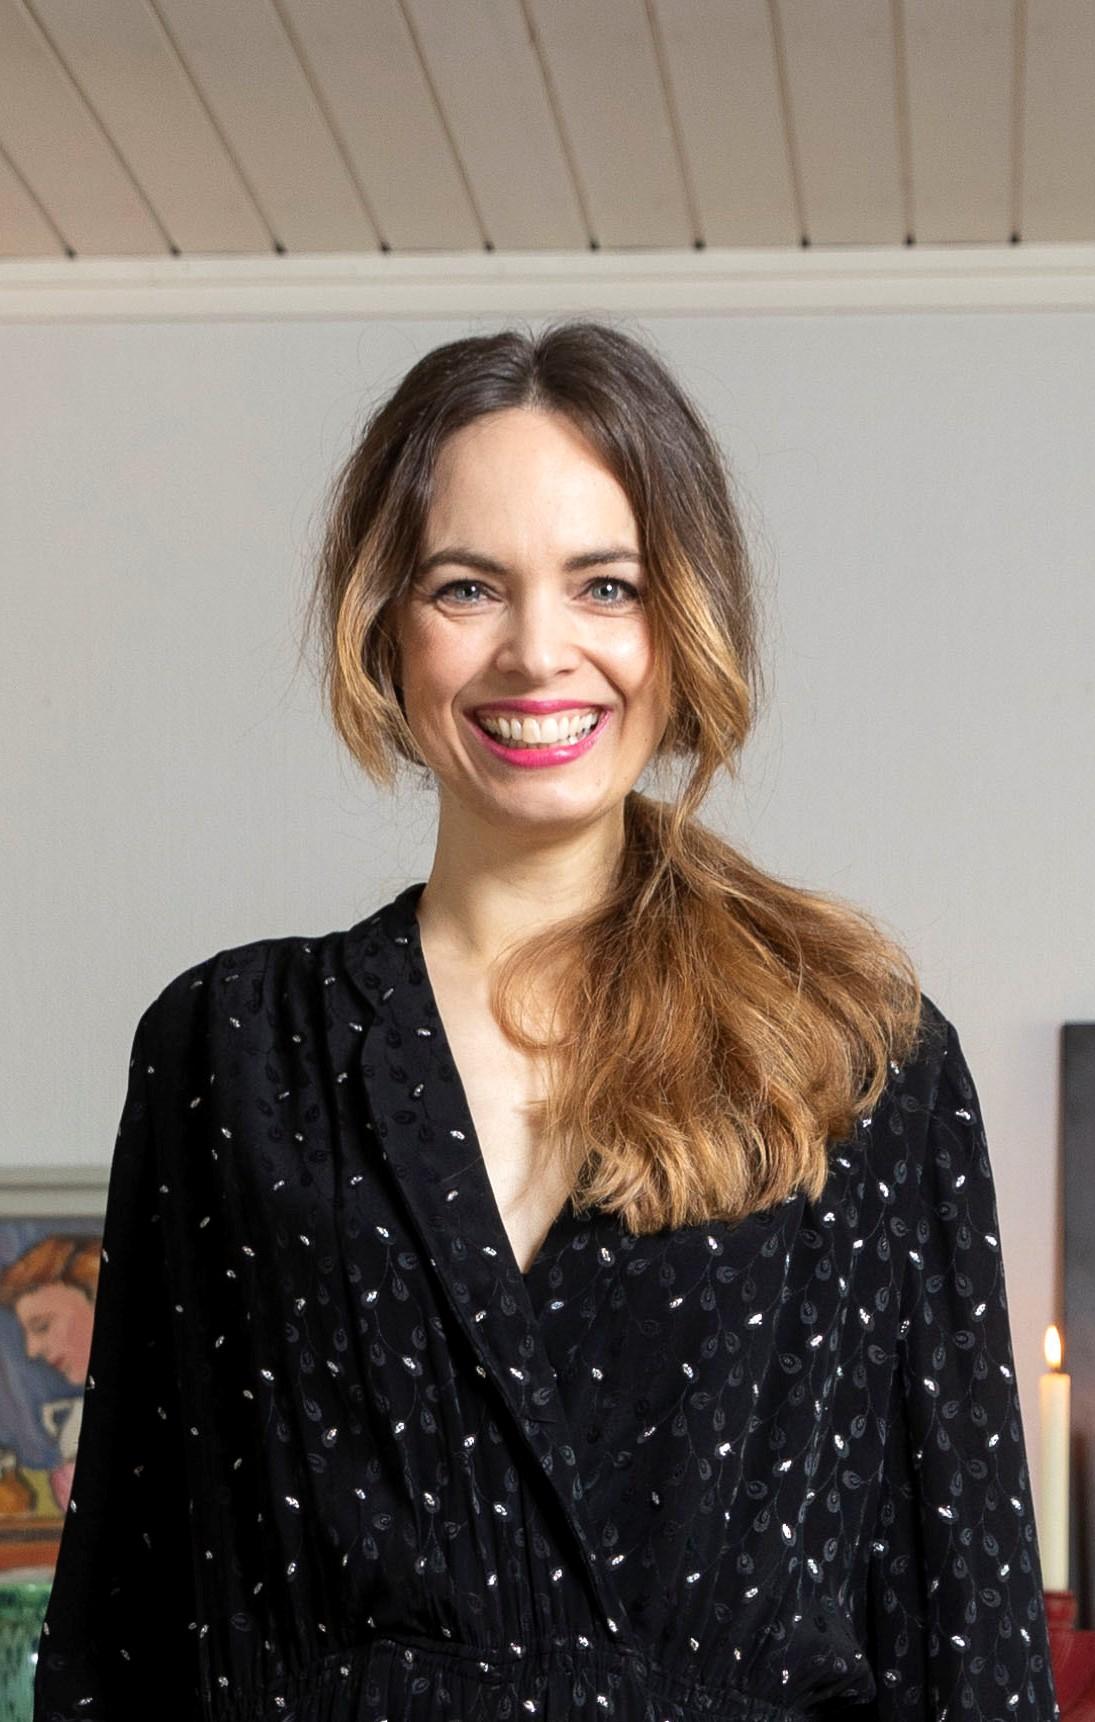 Camilla Harbu Bielecki